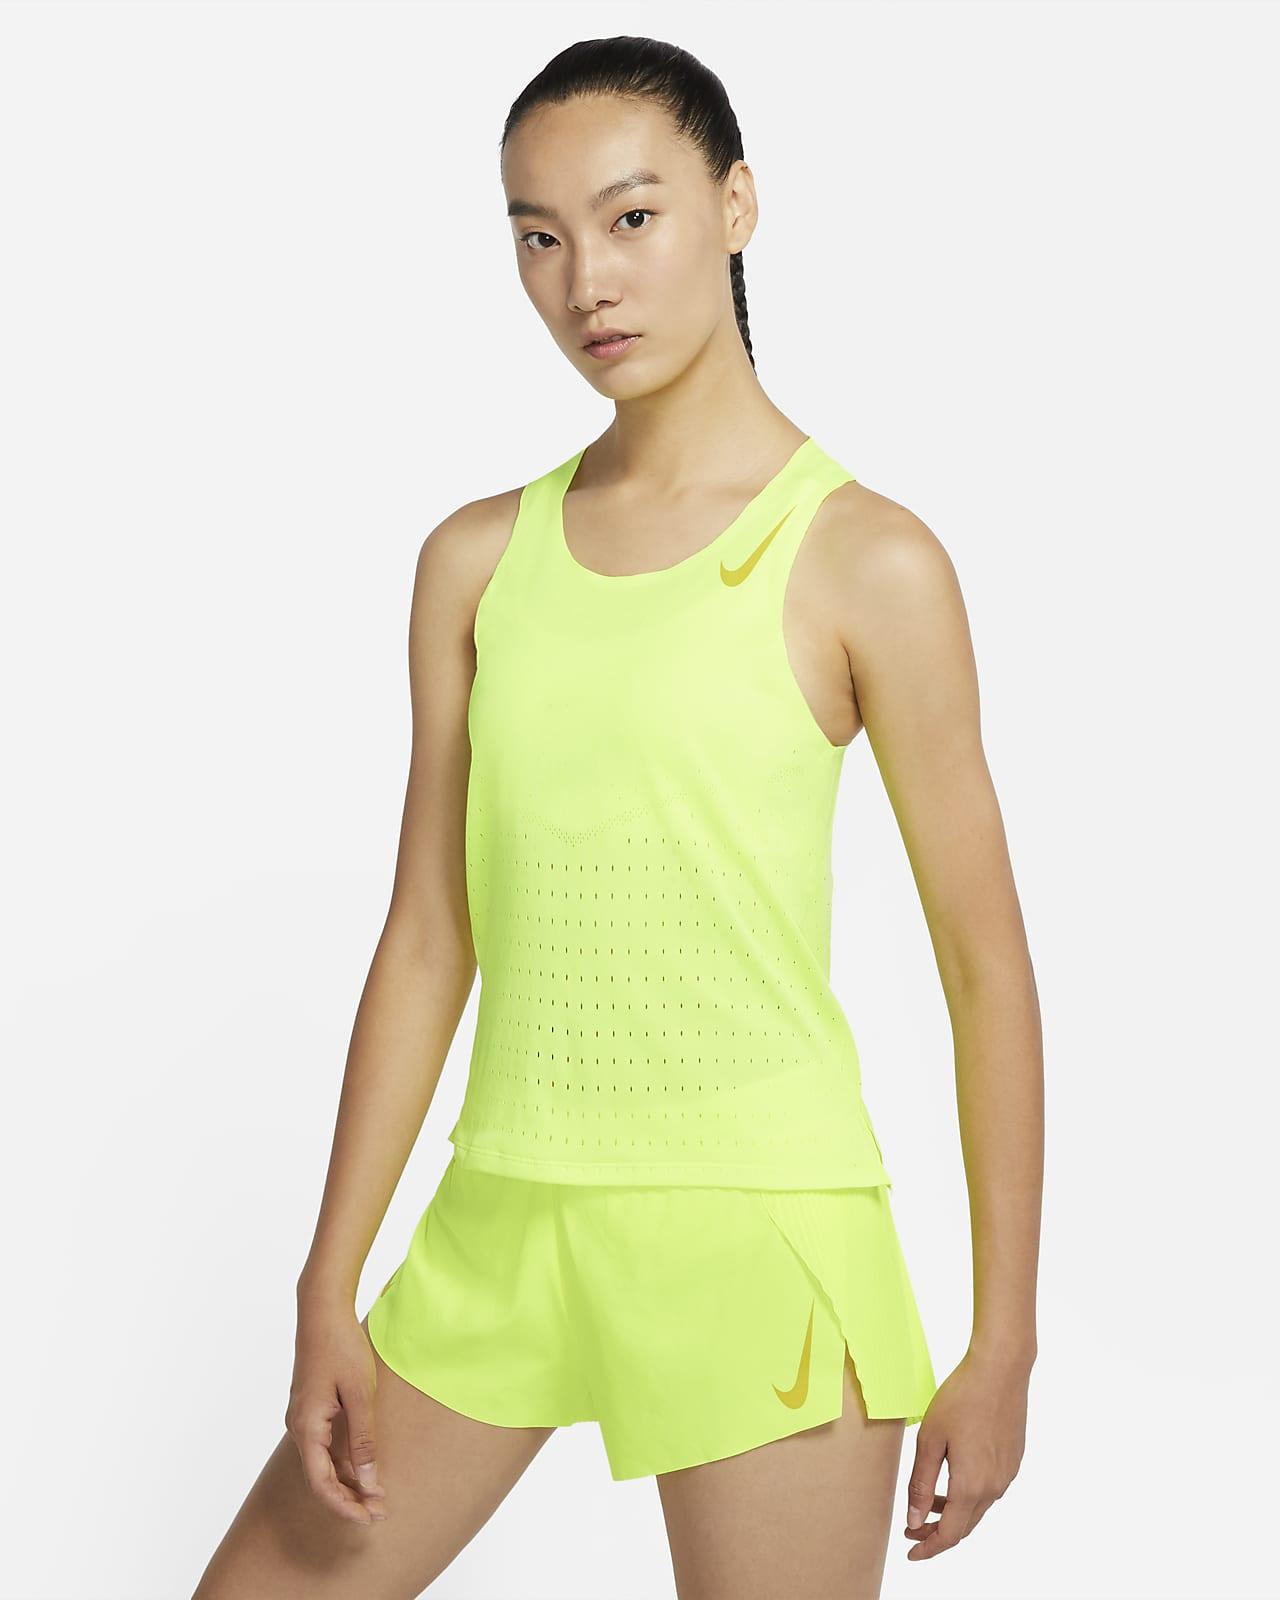 Nike AeroSwift Women's Running Vest